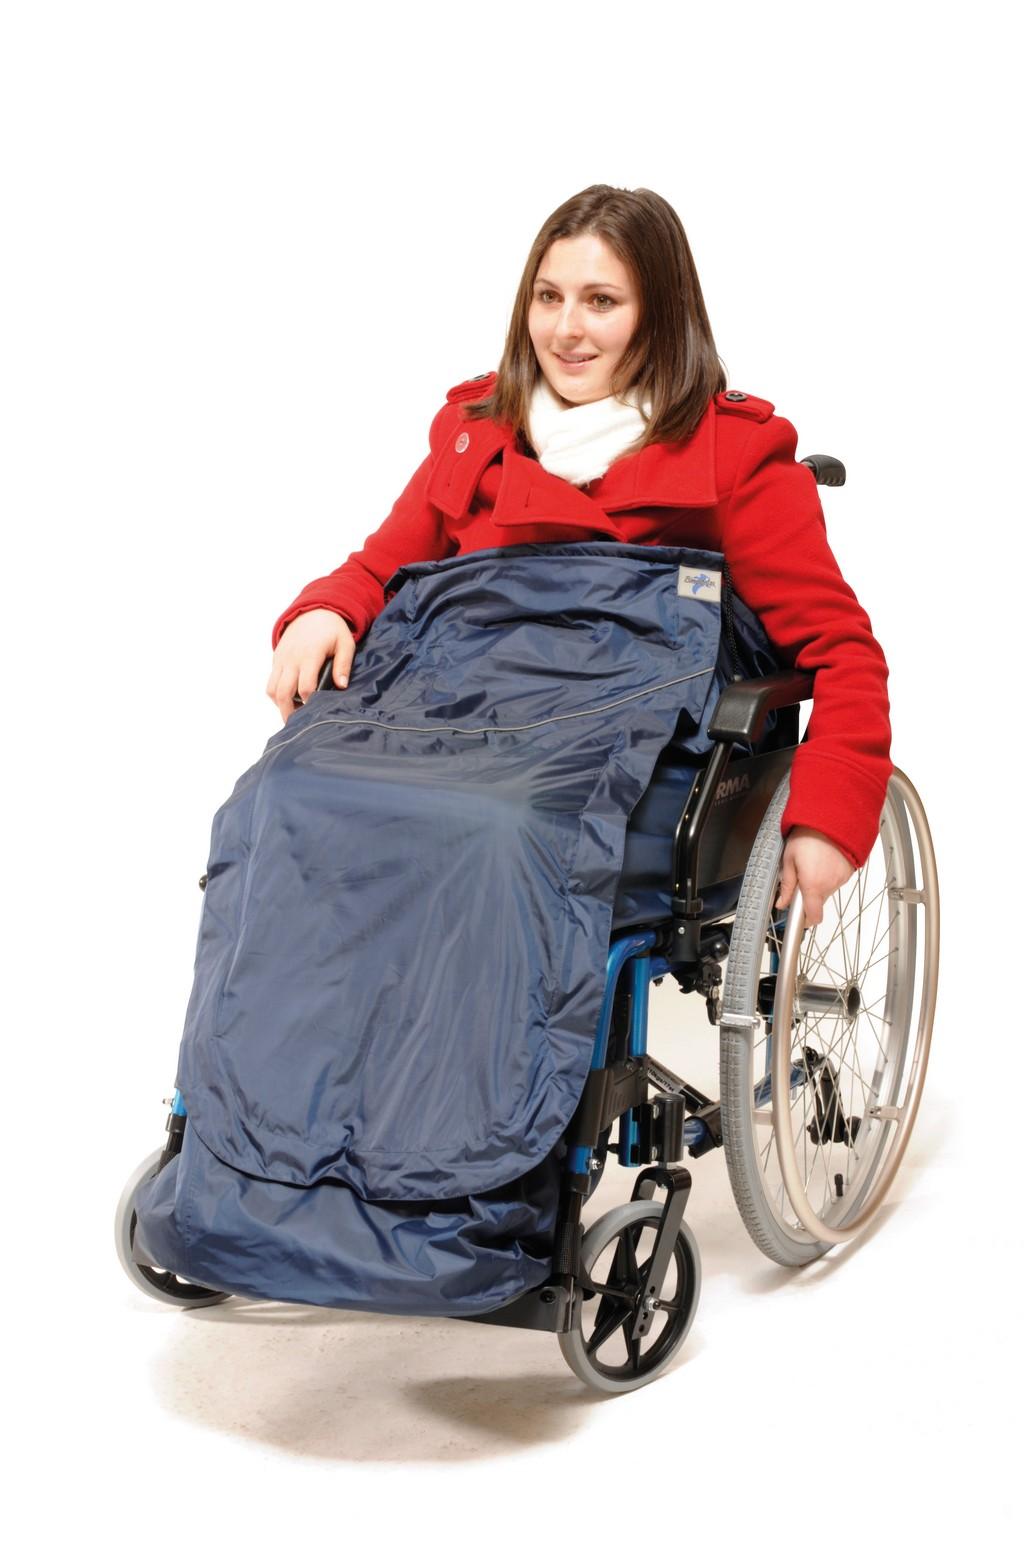 installing wheelchair tires, wheelchair tire covers, health lifting cushion, power wheelchair lights